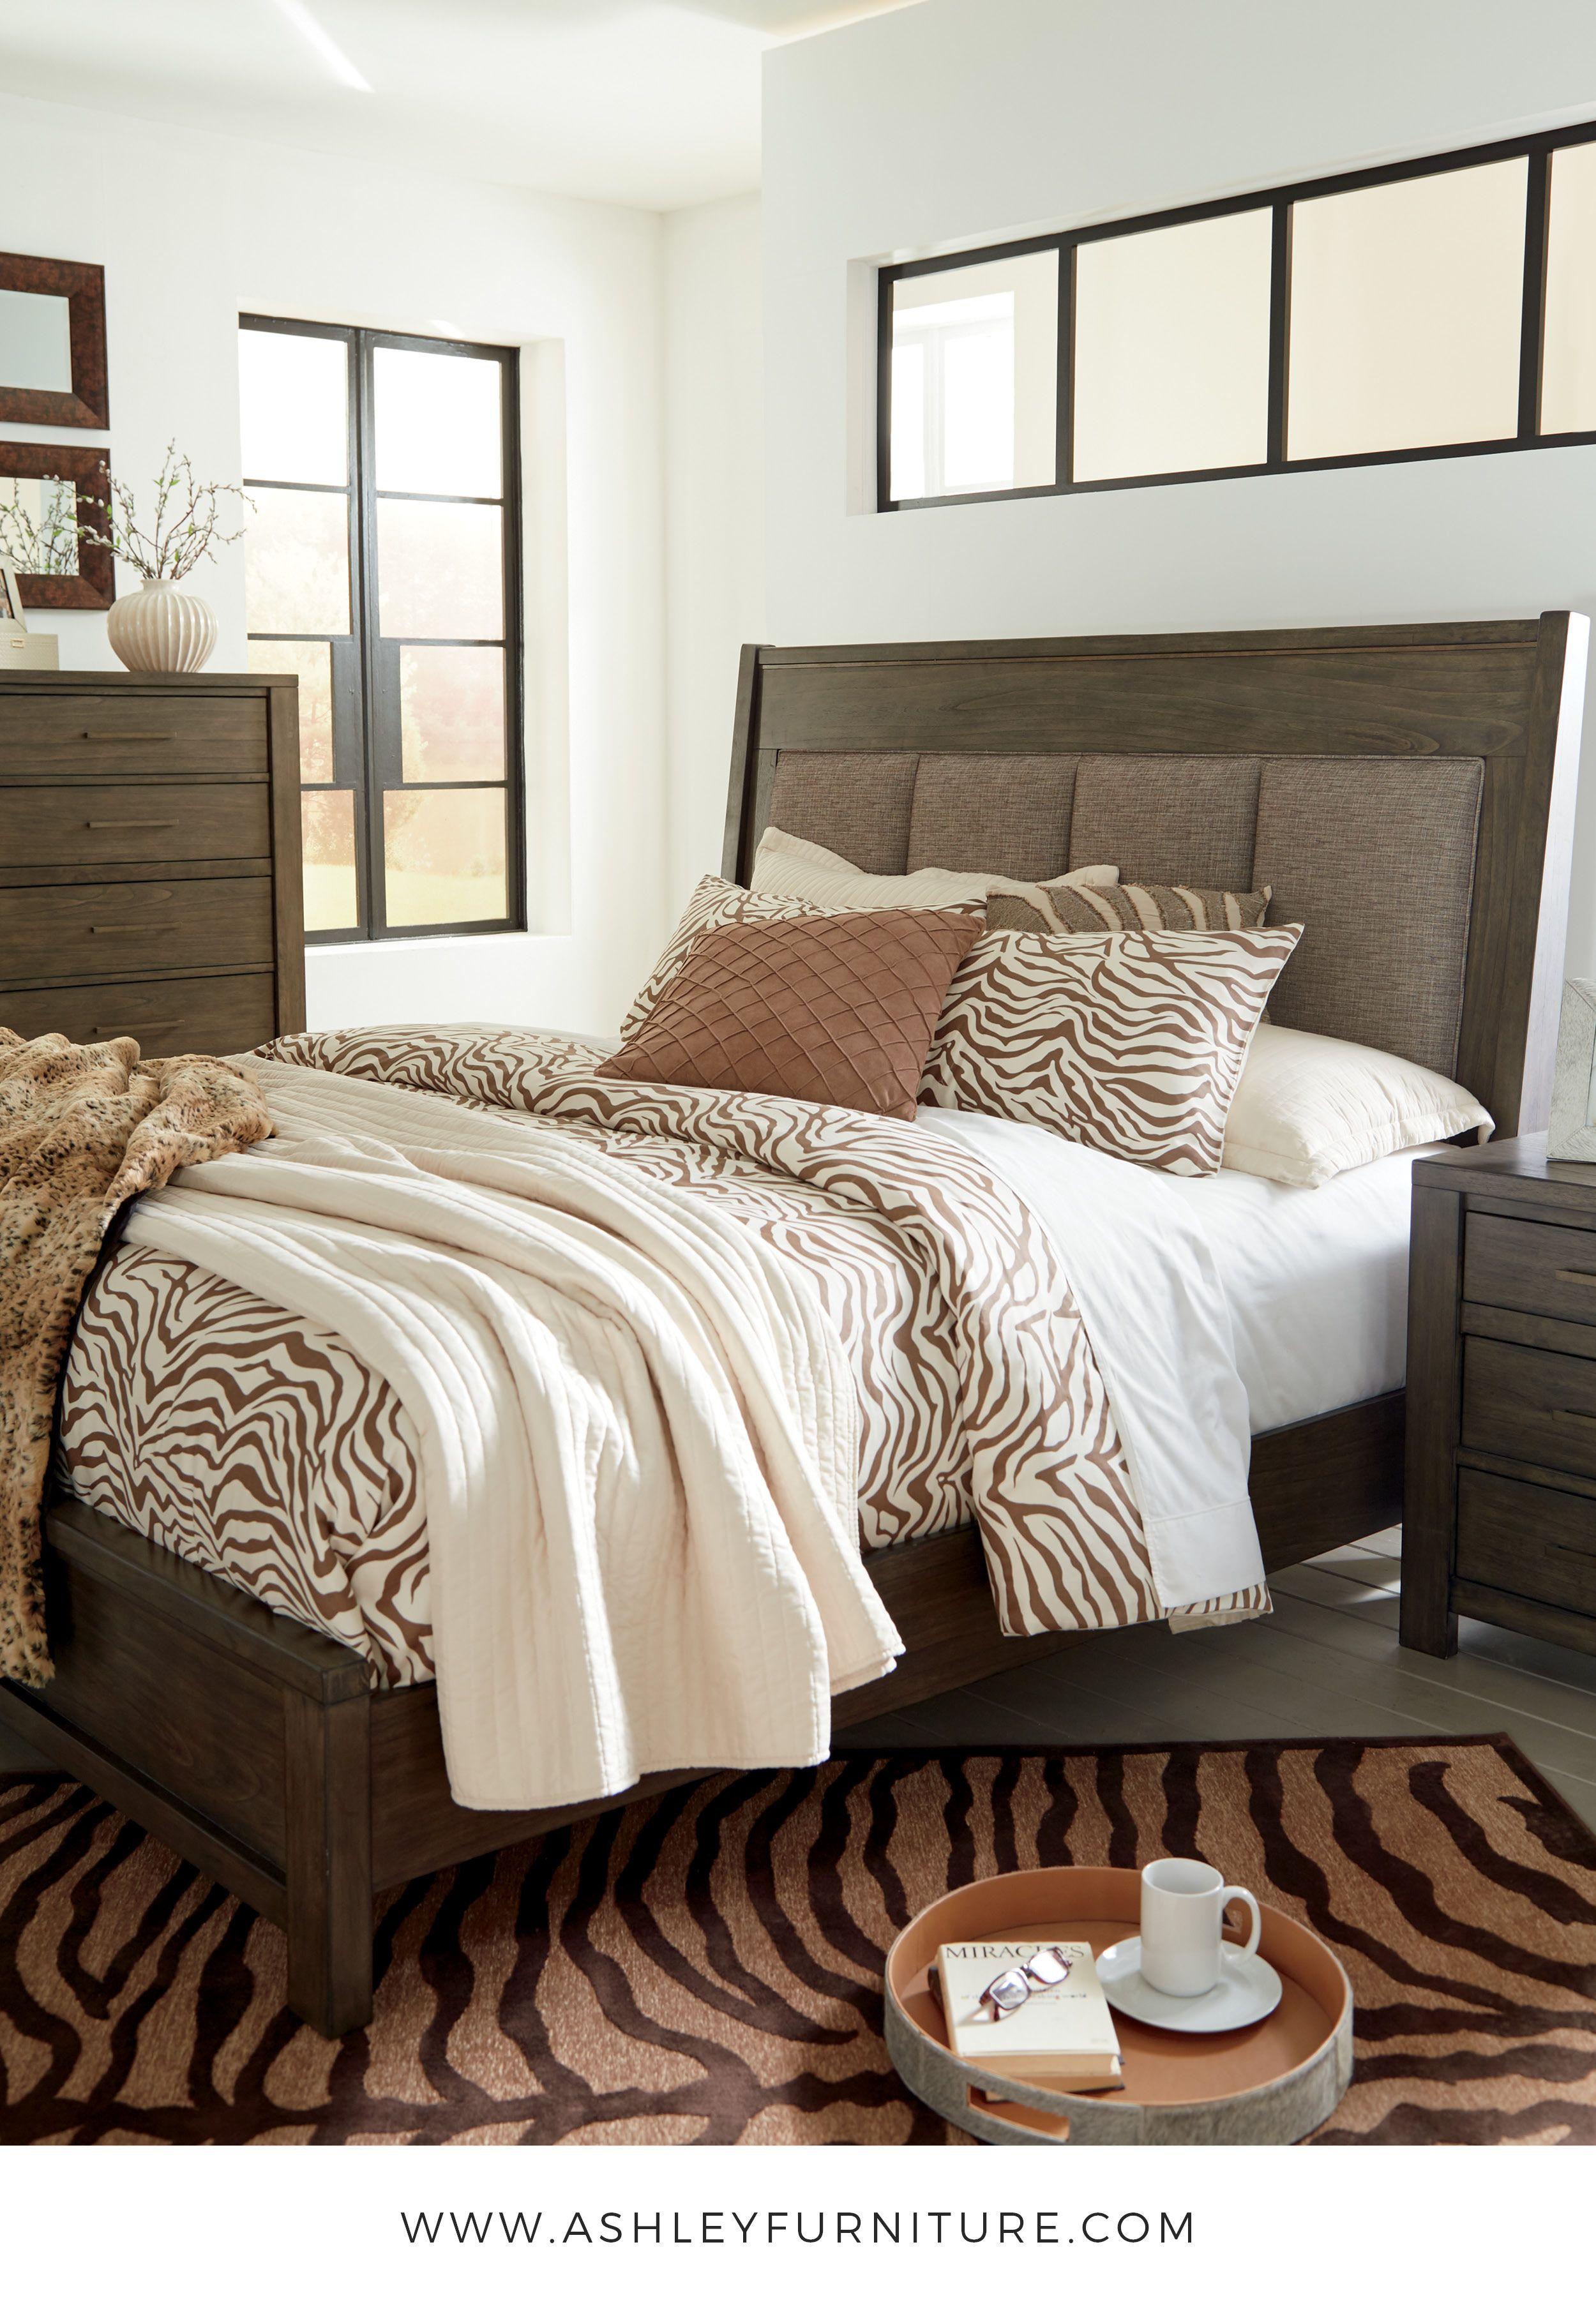 Camilone Bedroom Set By Ashley Furniture Boho Haven Bohemian